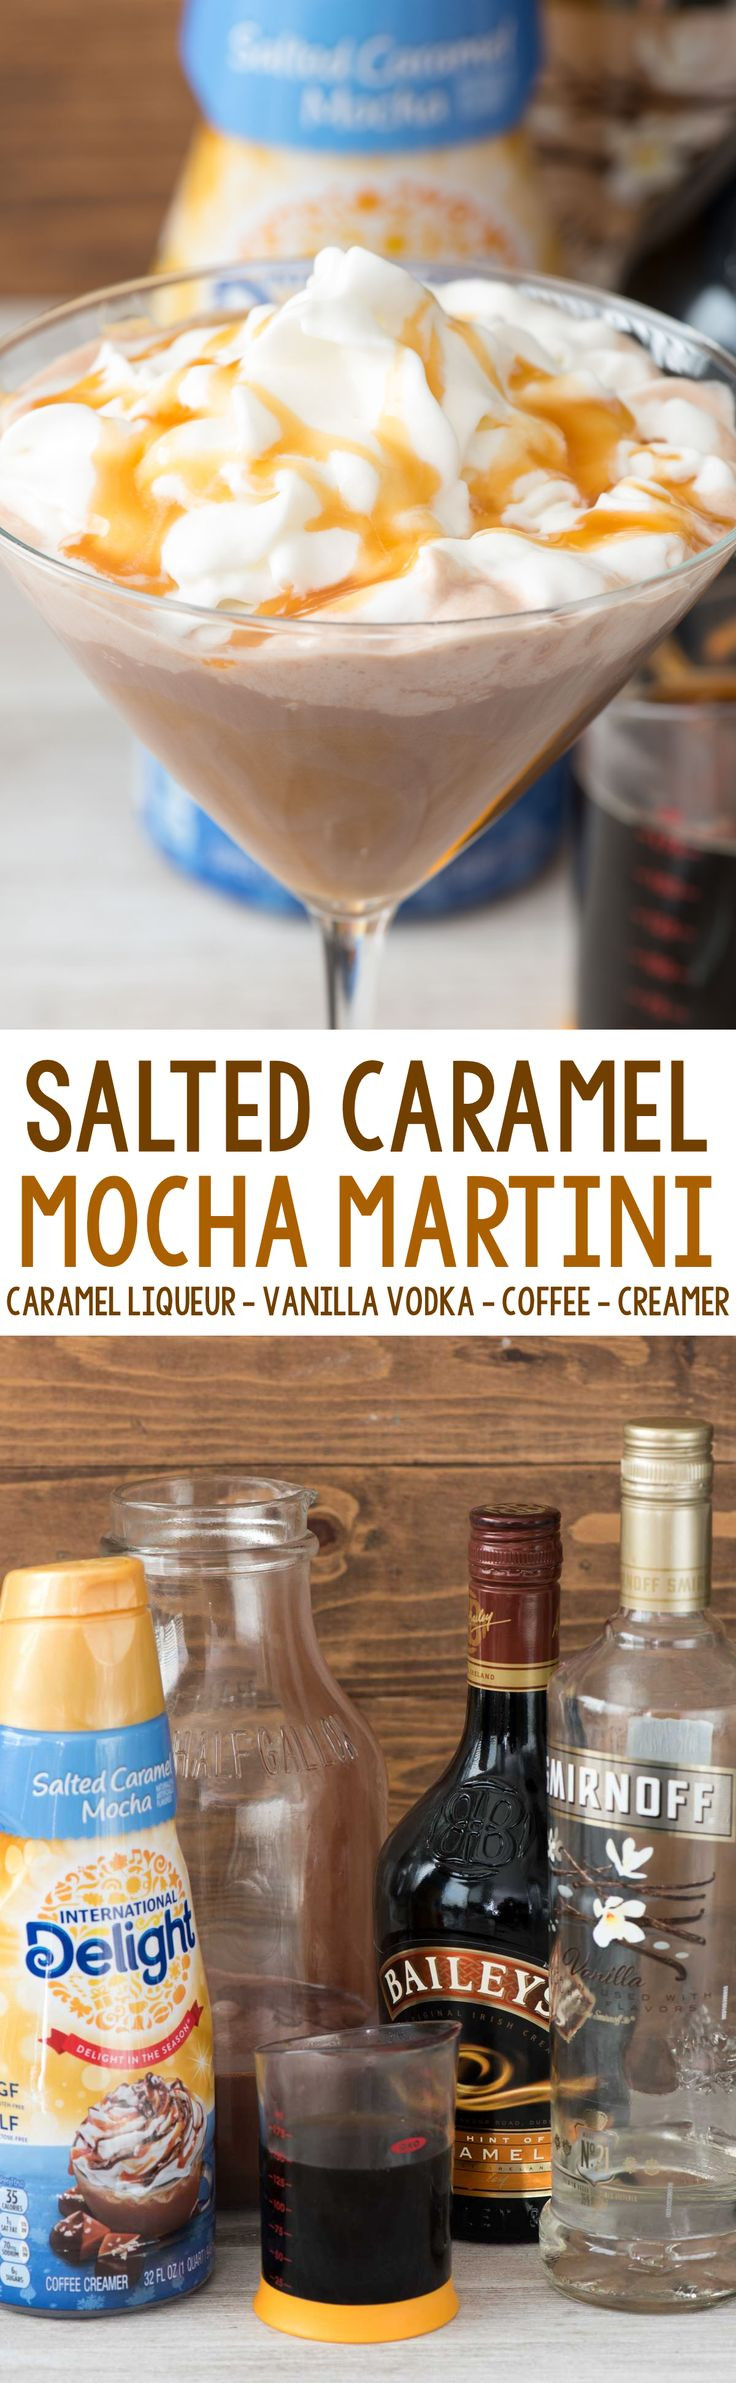 Salted Caramel Vodka Drinks  Salted Caramel Mocha Martini Recipe